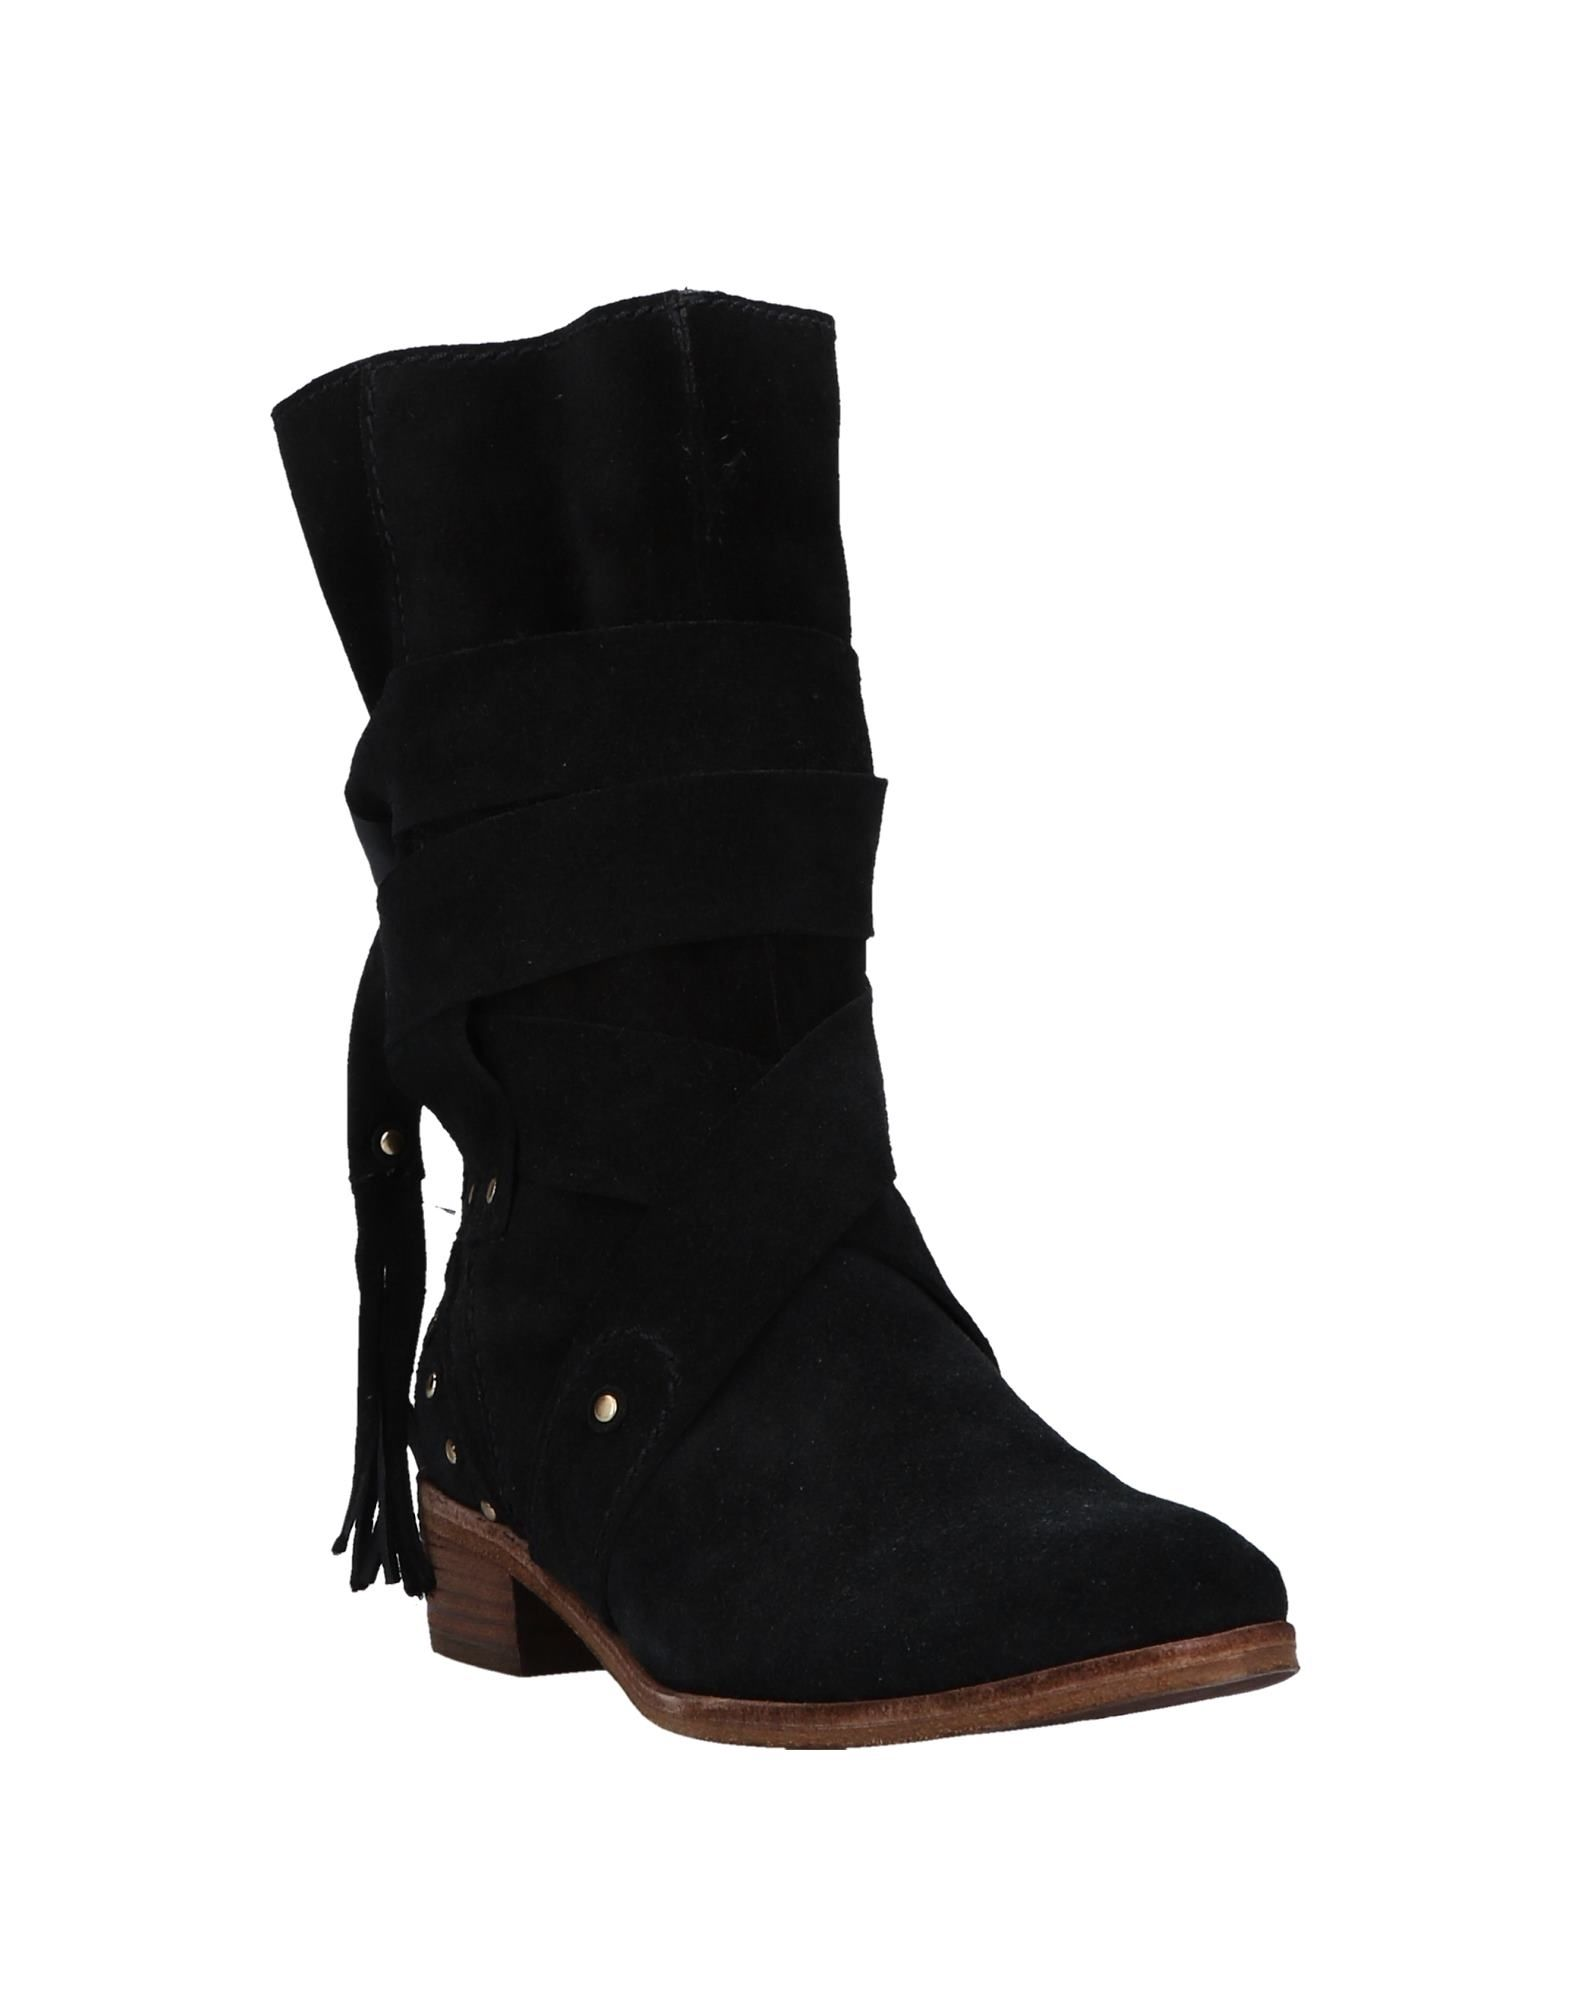 Rabatt Chloé Schuhe See By Chloé Rabatt Stiefelette Damen  11532380AX 2fb20c